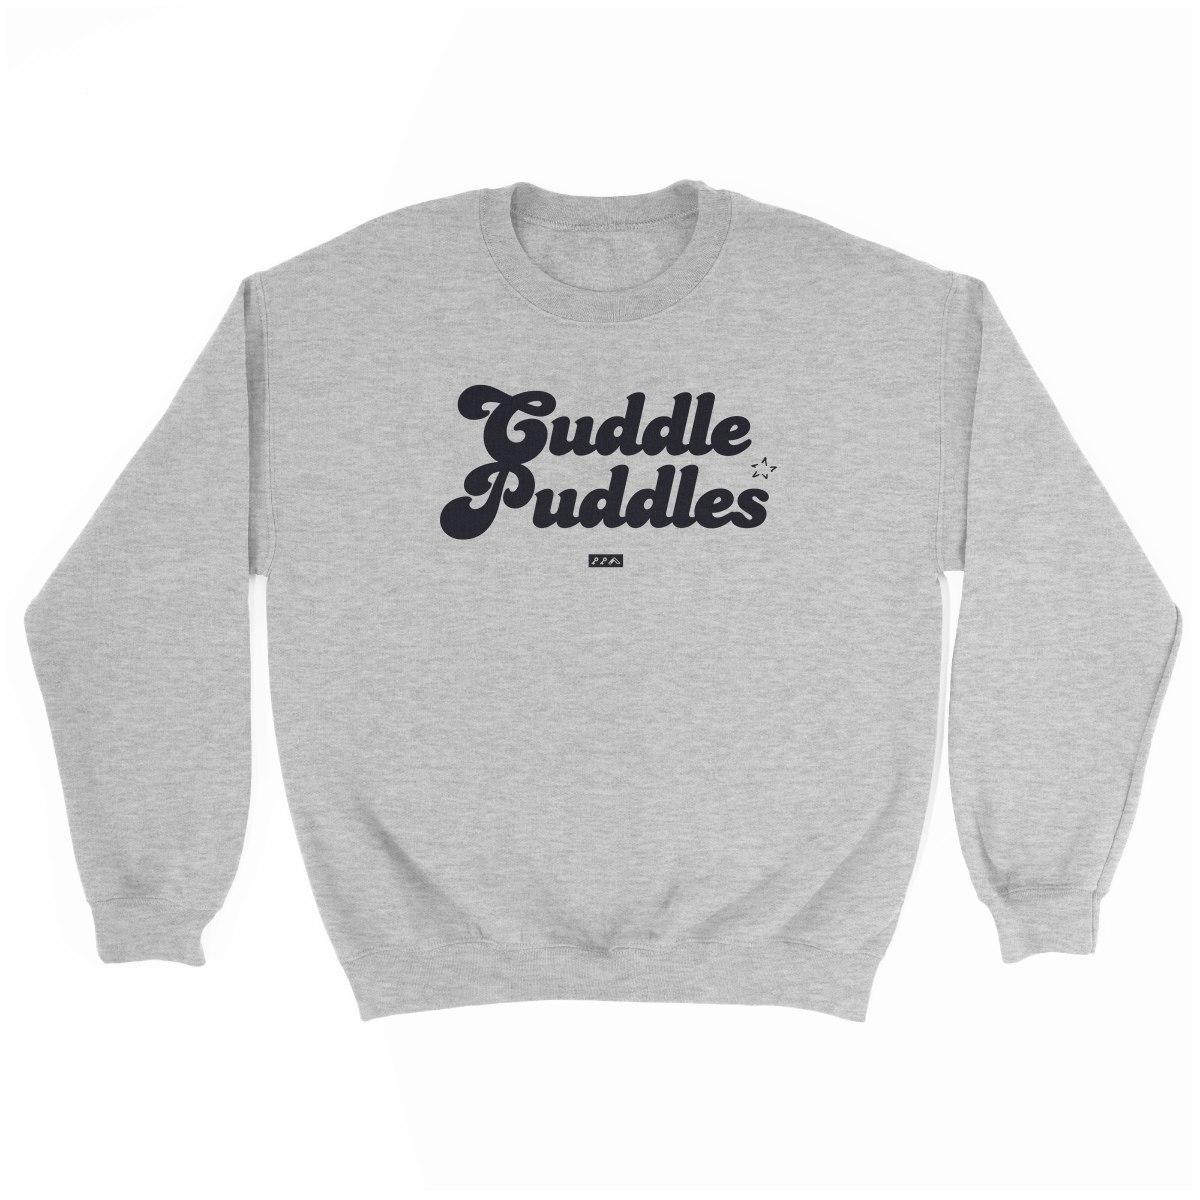 CUDDLE PUDDLE PARTY comfy sweatshirt in grey at kikicutt.com